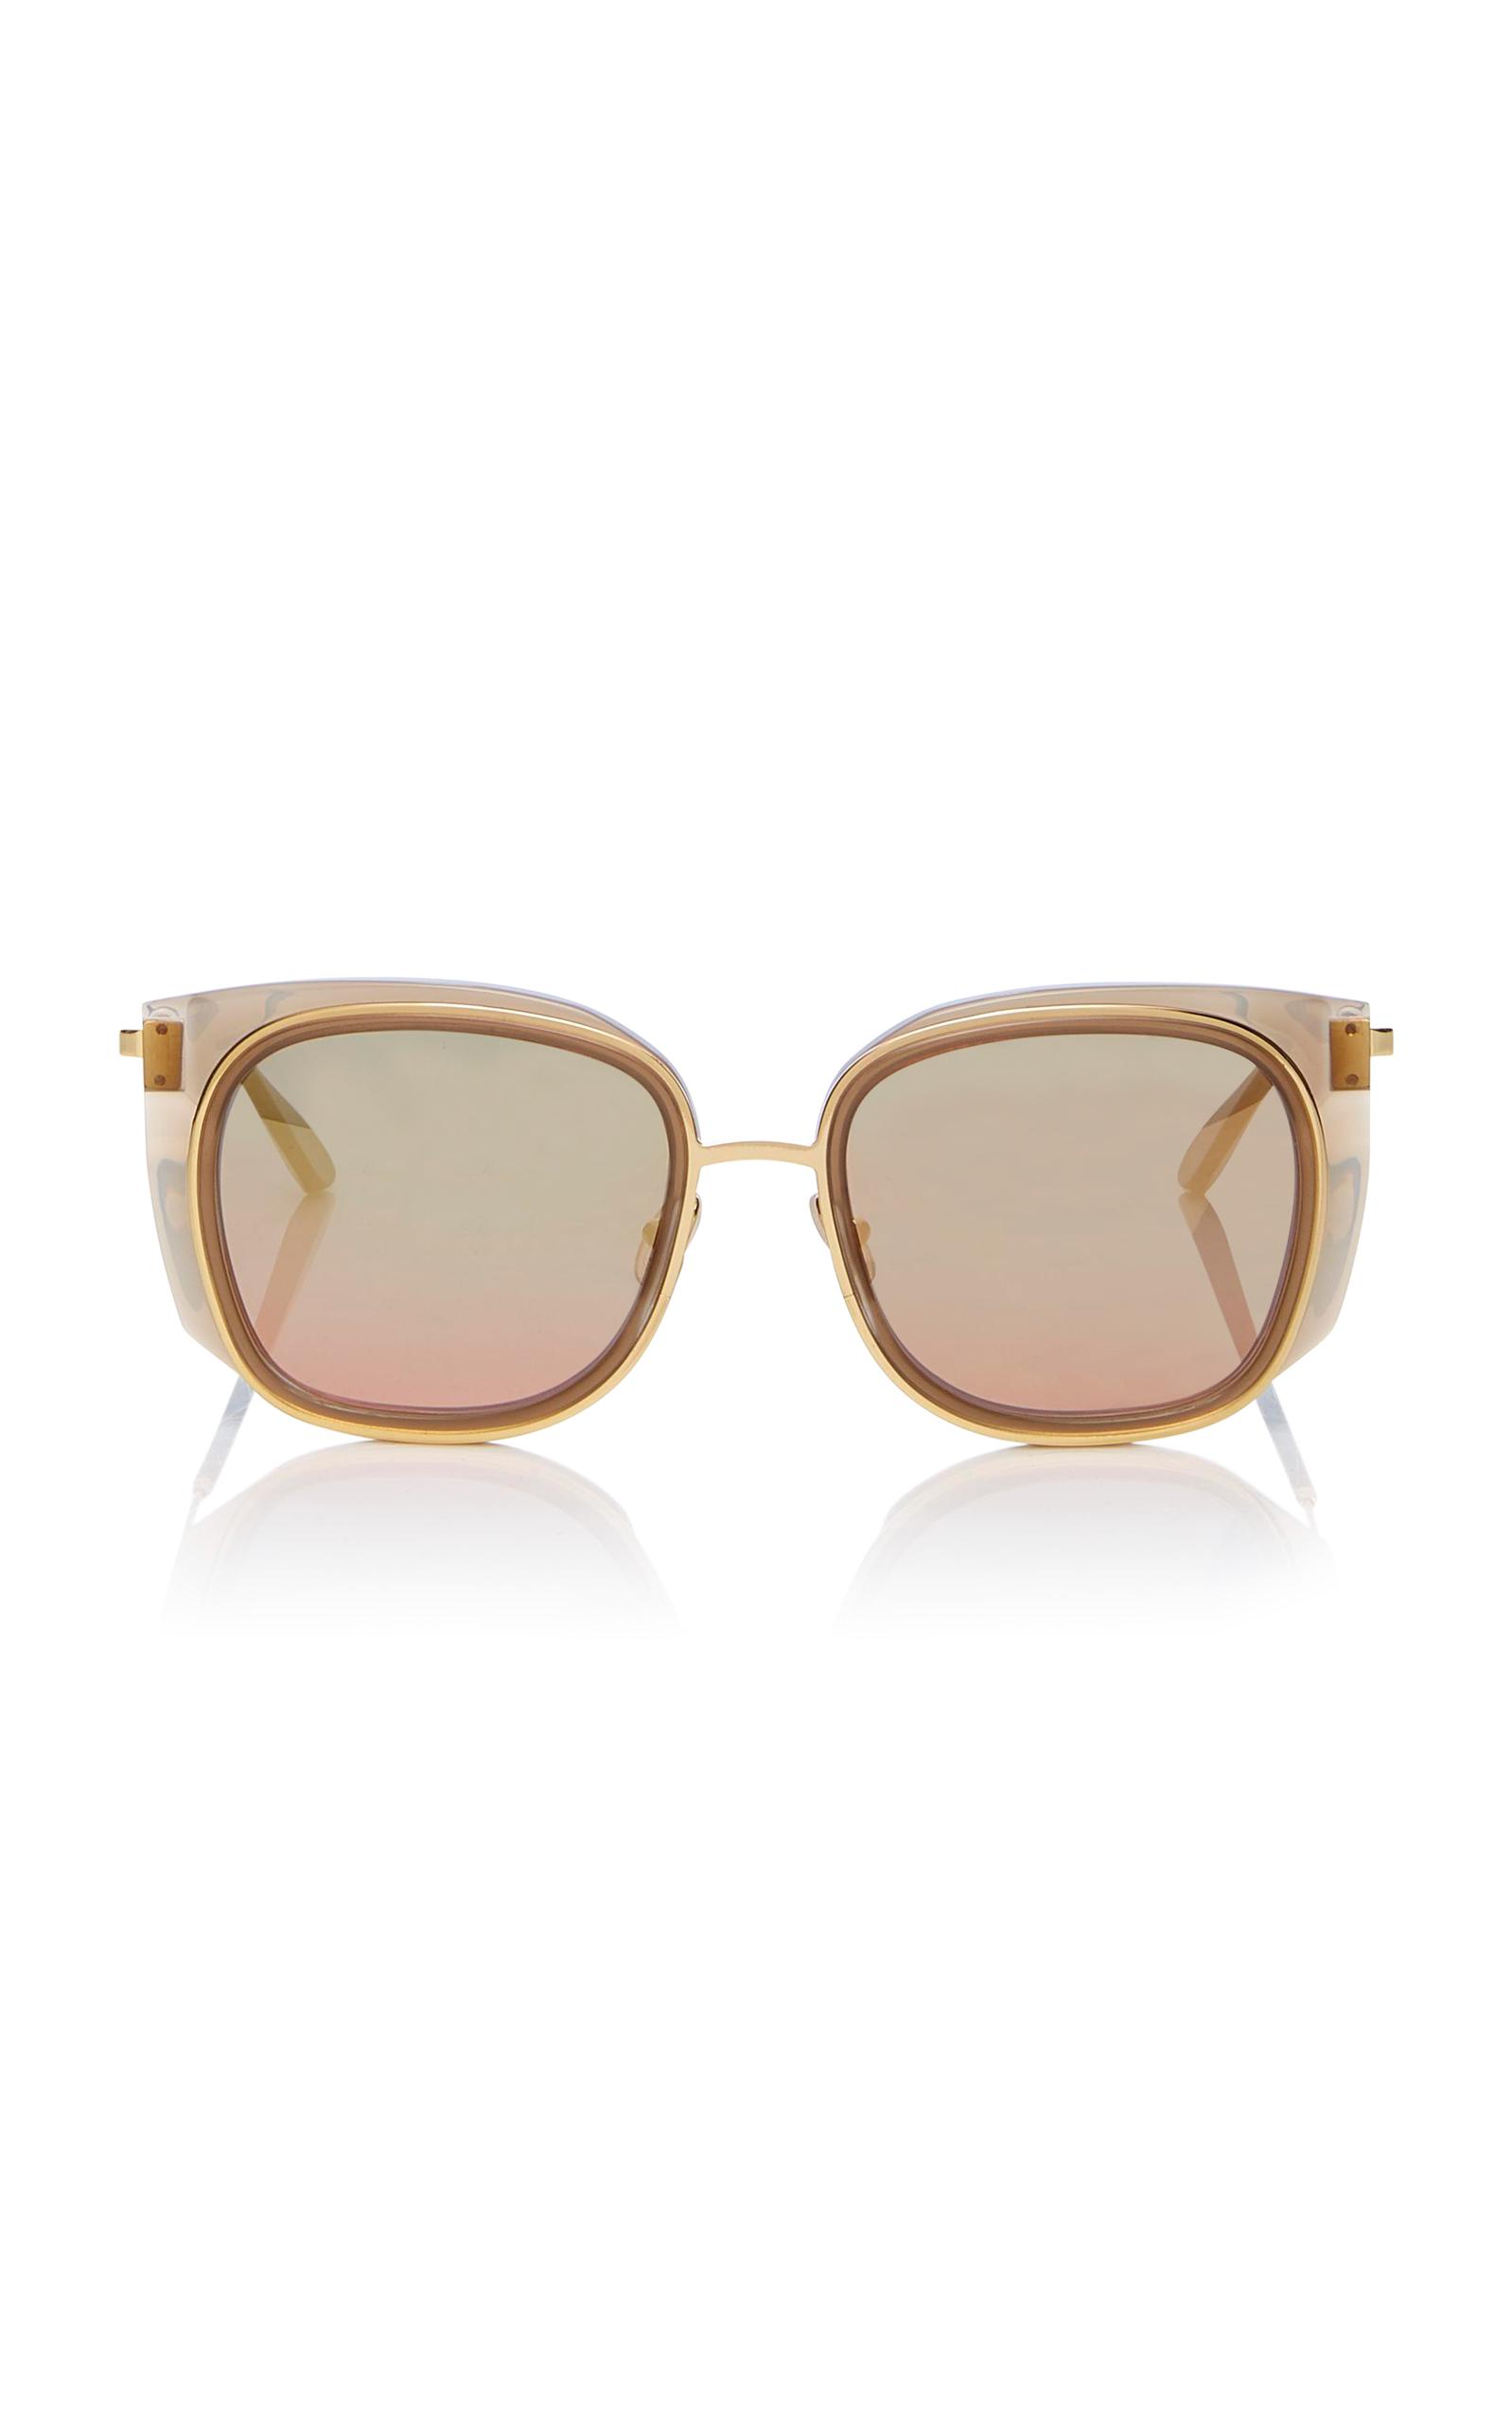 Everlasty Square-frame Acetate And Gold-tone Sunglasses - Black Thierry Lasry eZdZhaCdm